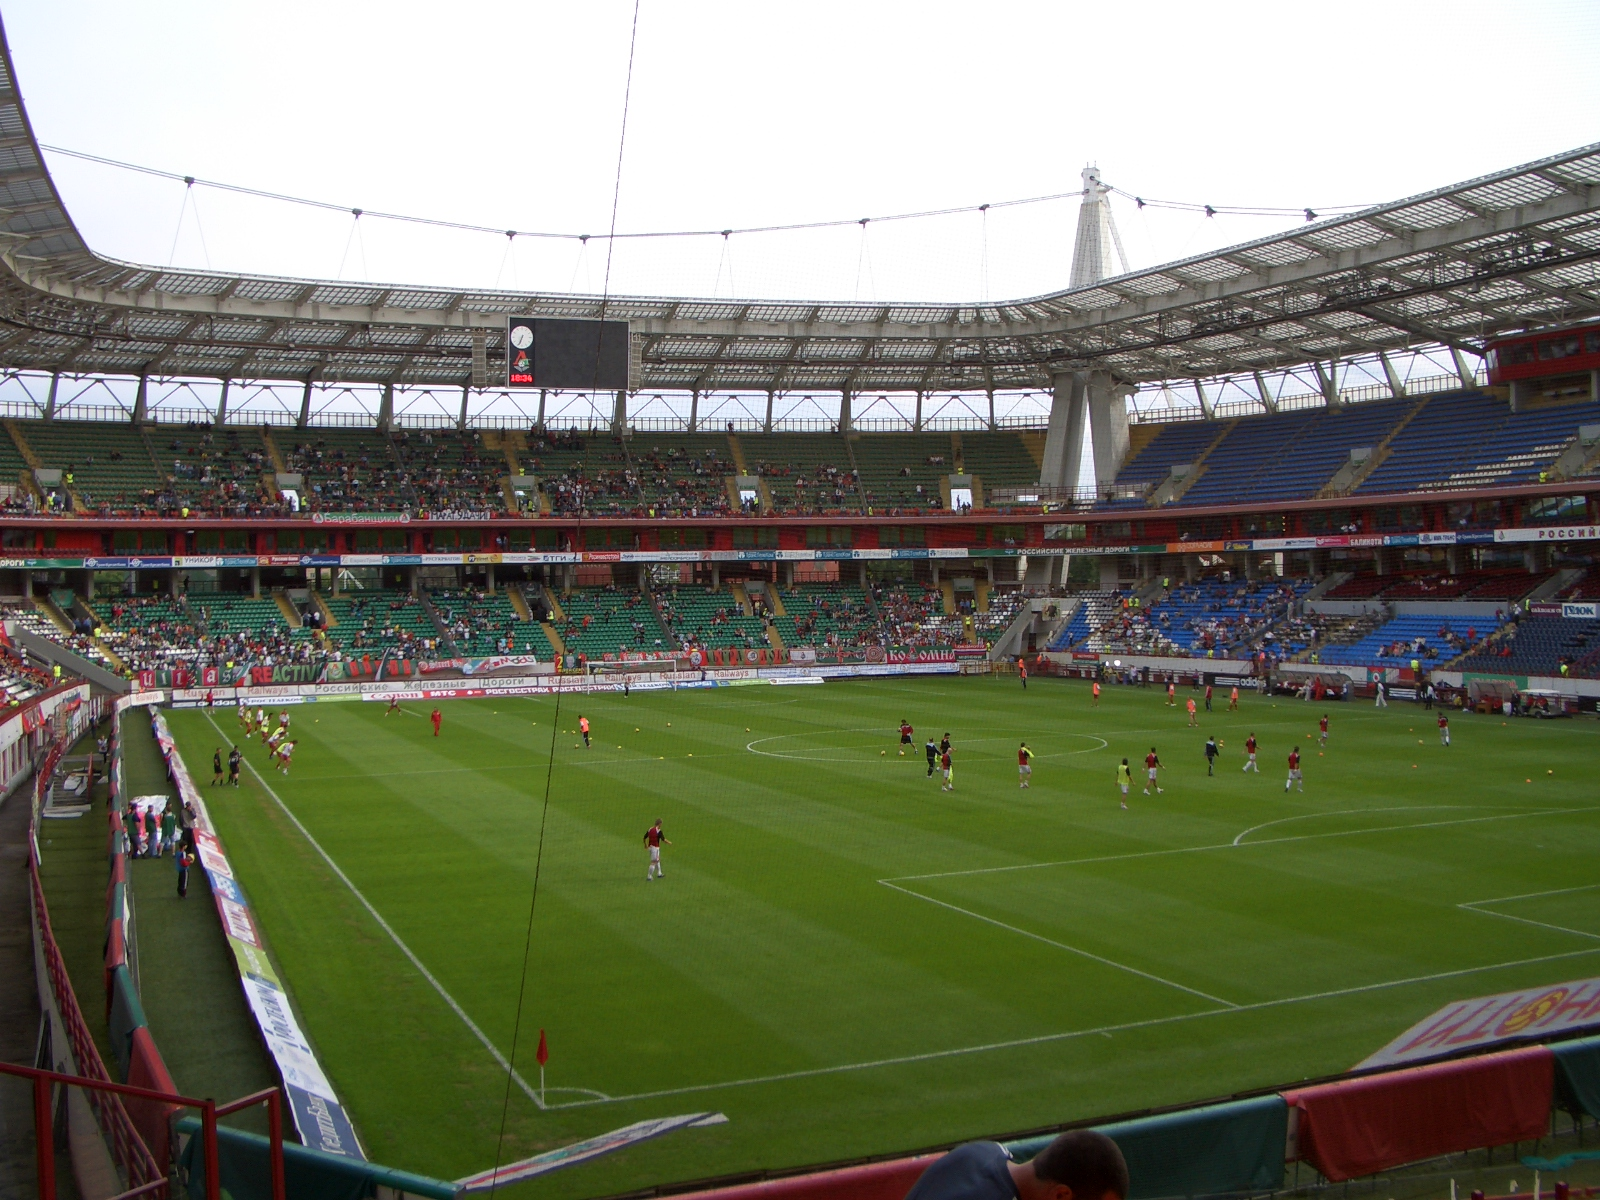 Lokomotiv Stadium Tbilisi Lokomotiv-stadium.jpg